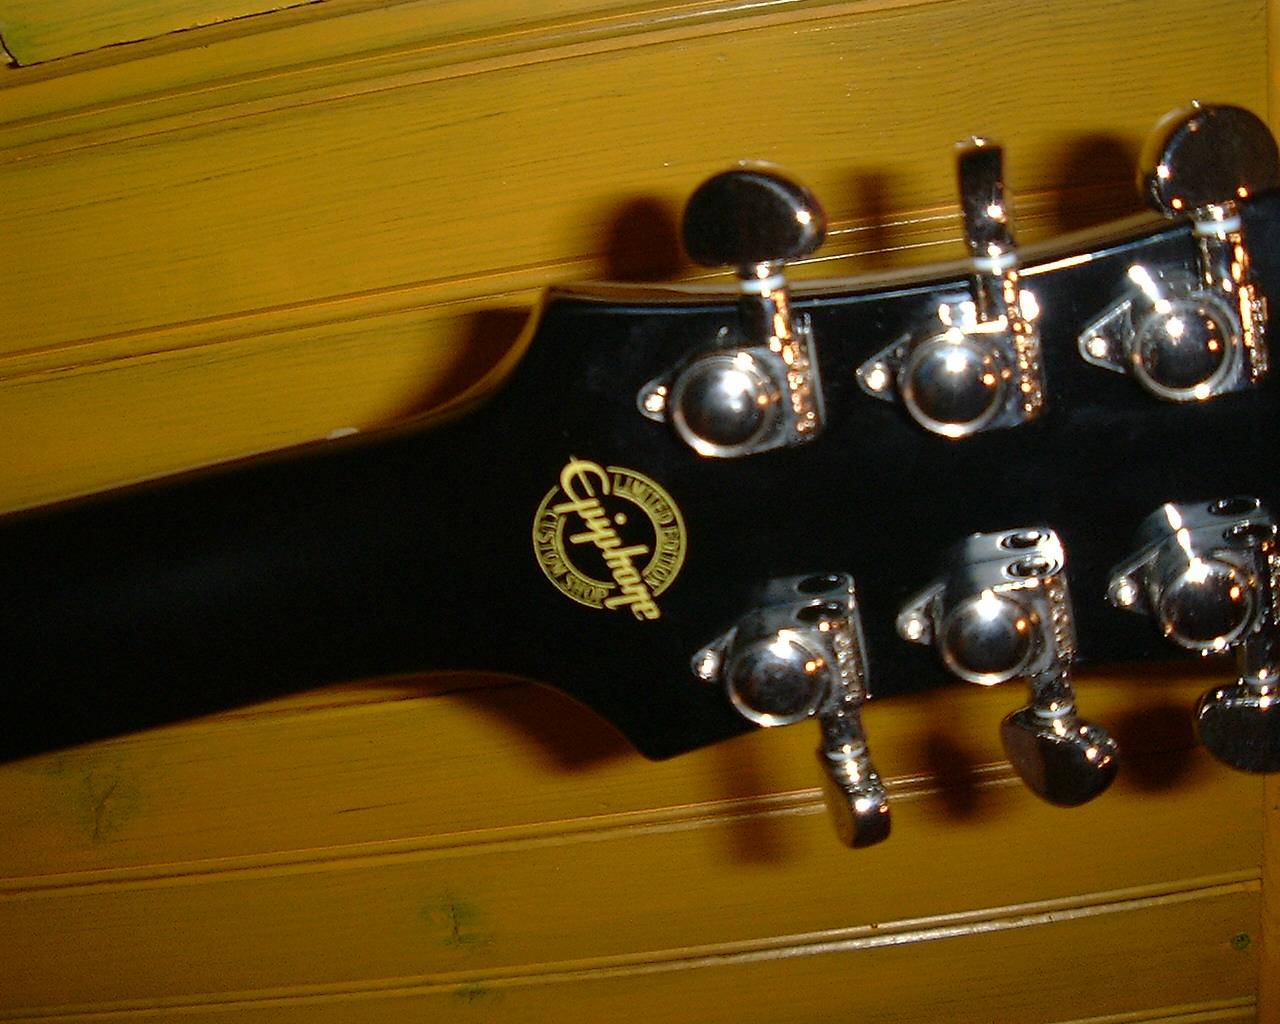 Epiphone Limited Edition Les Paul Standard Black Royale ...